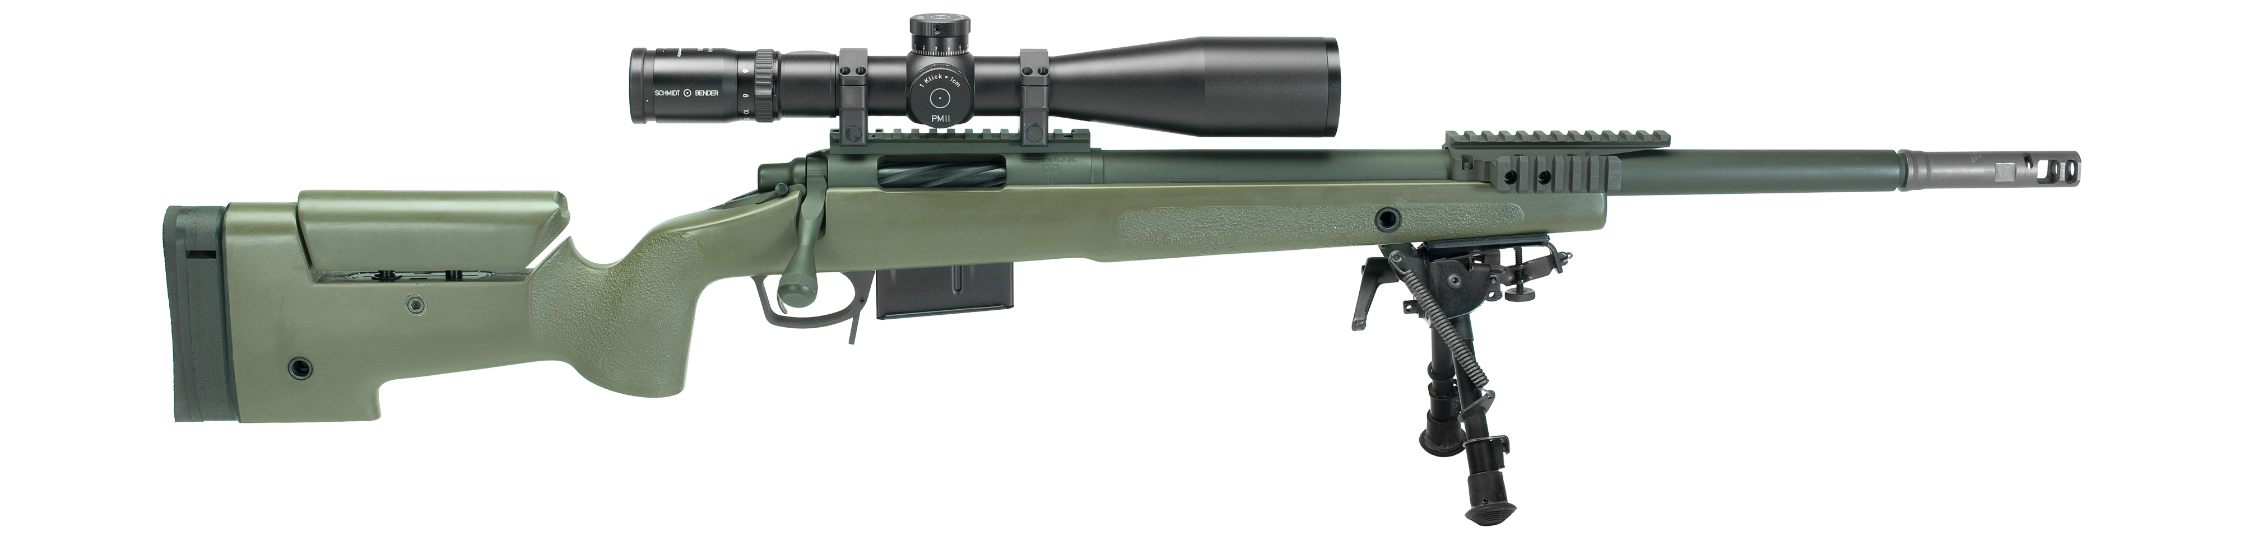 vector free Vector carbine 9 millimeter. Custom rifles fbi hrt